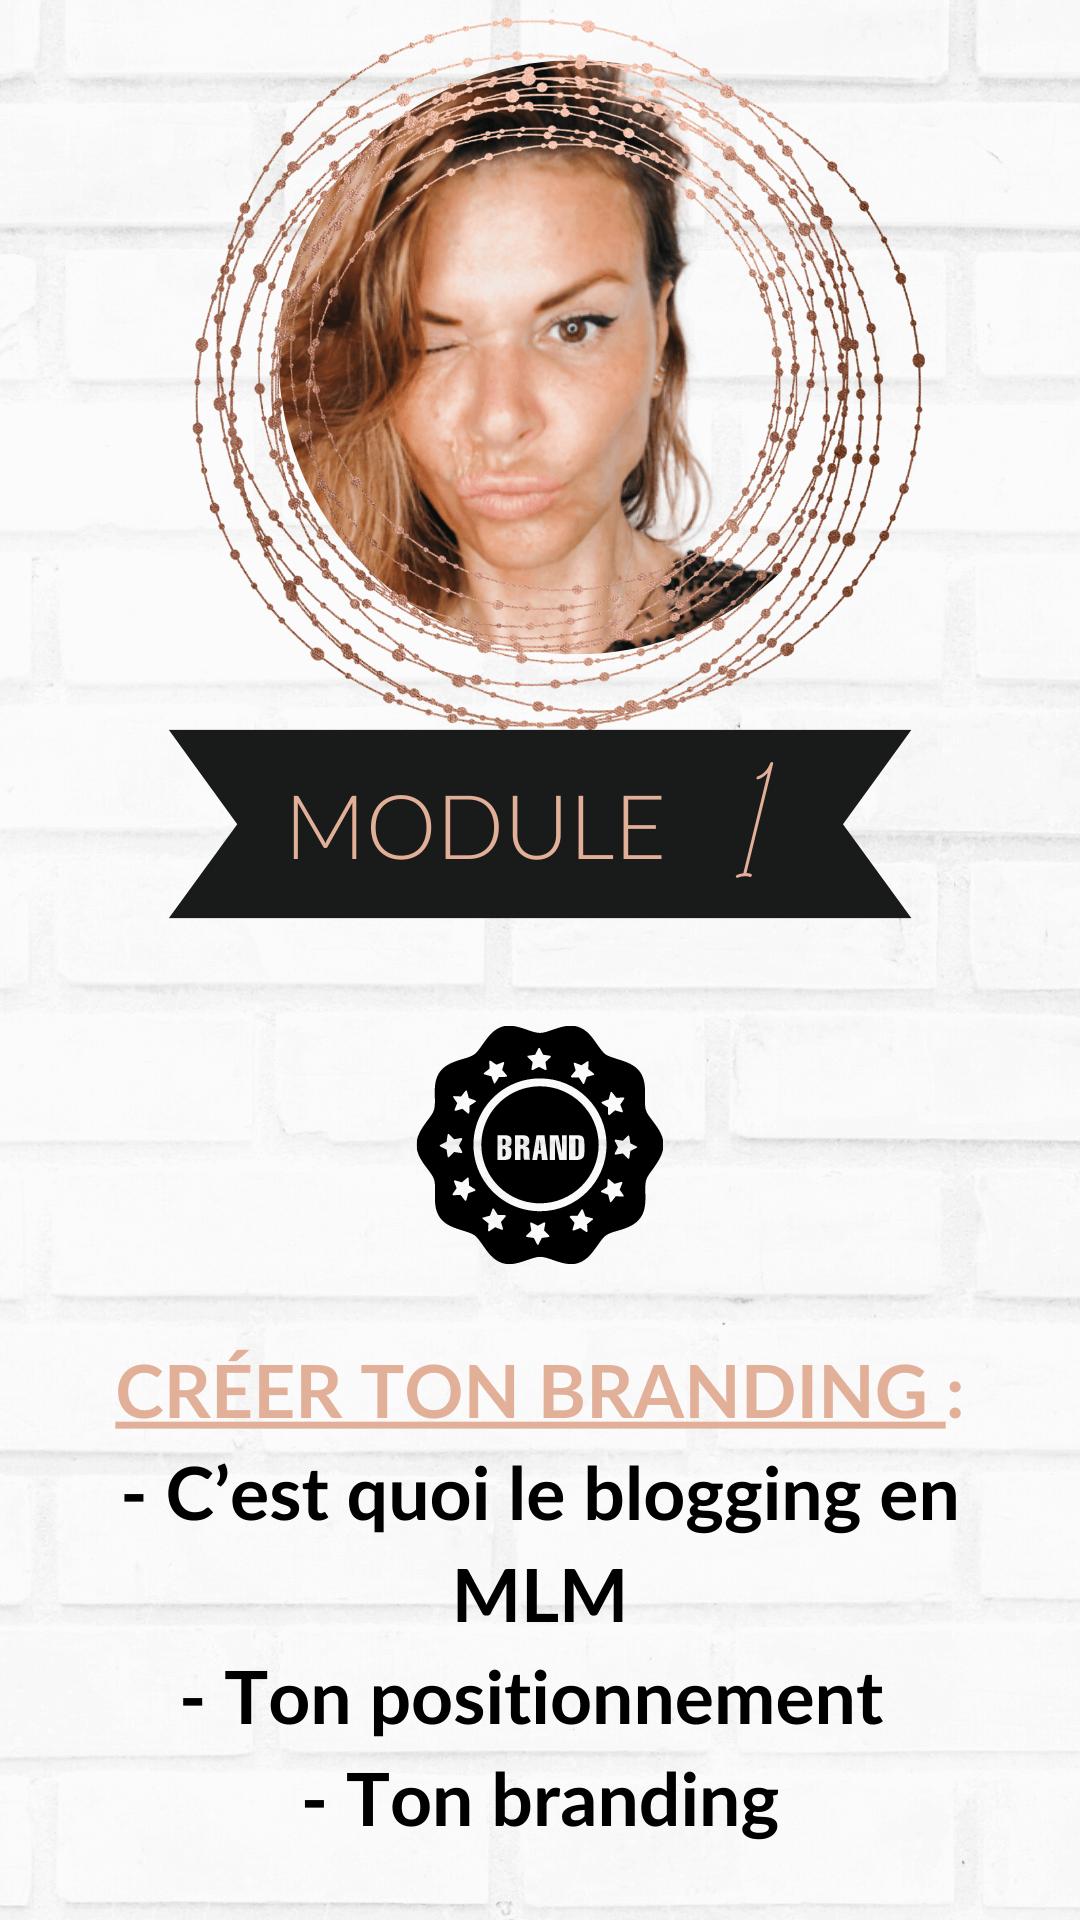 module-1-mlm